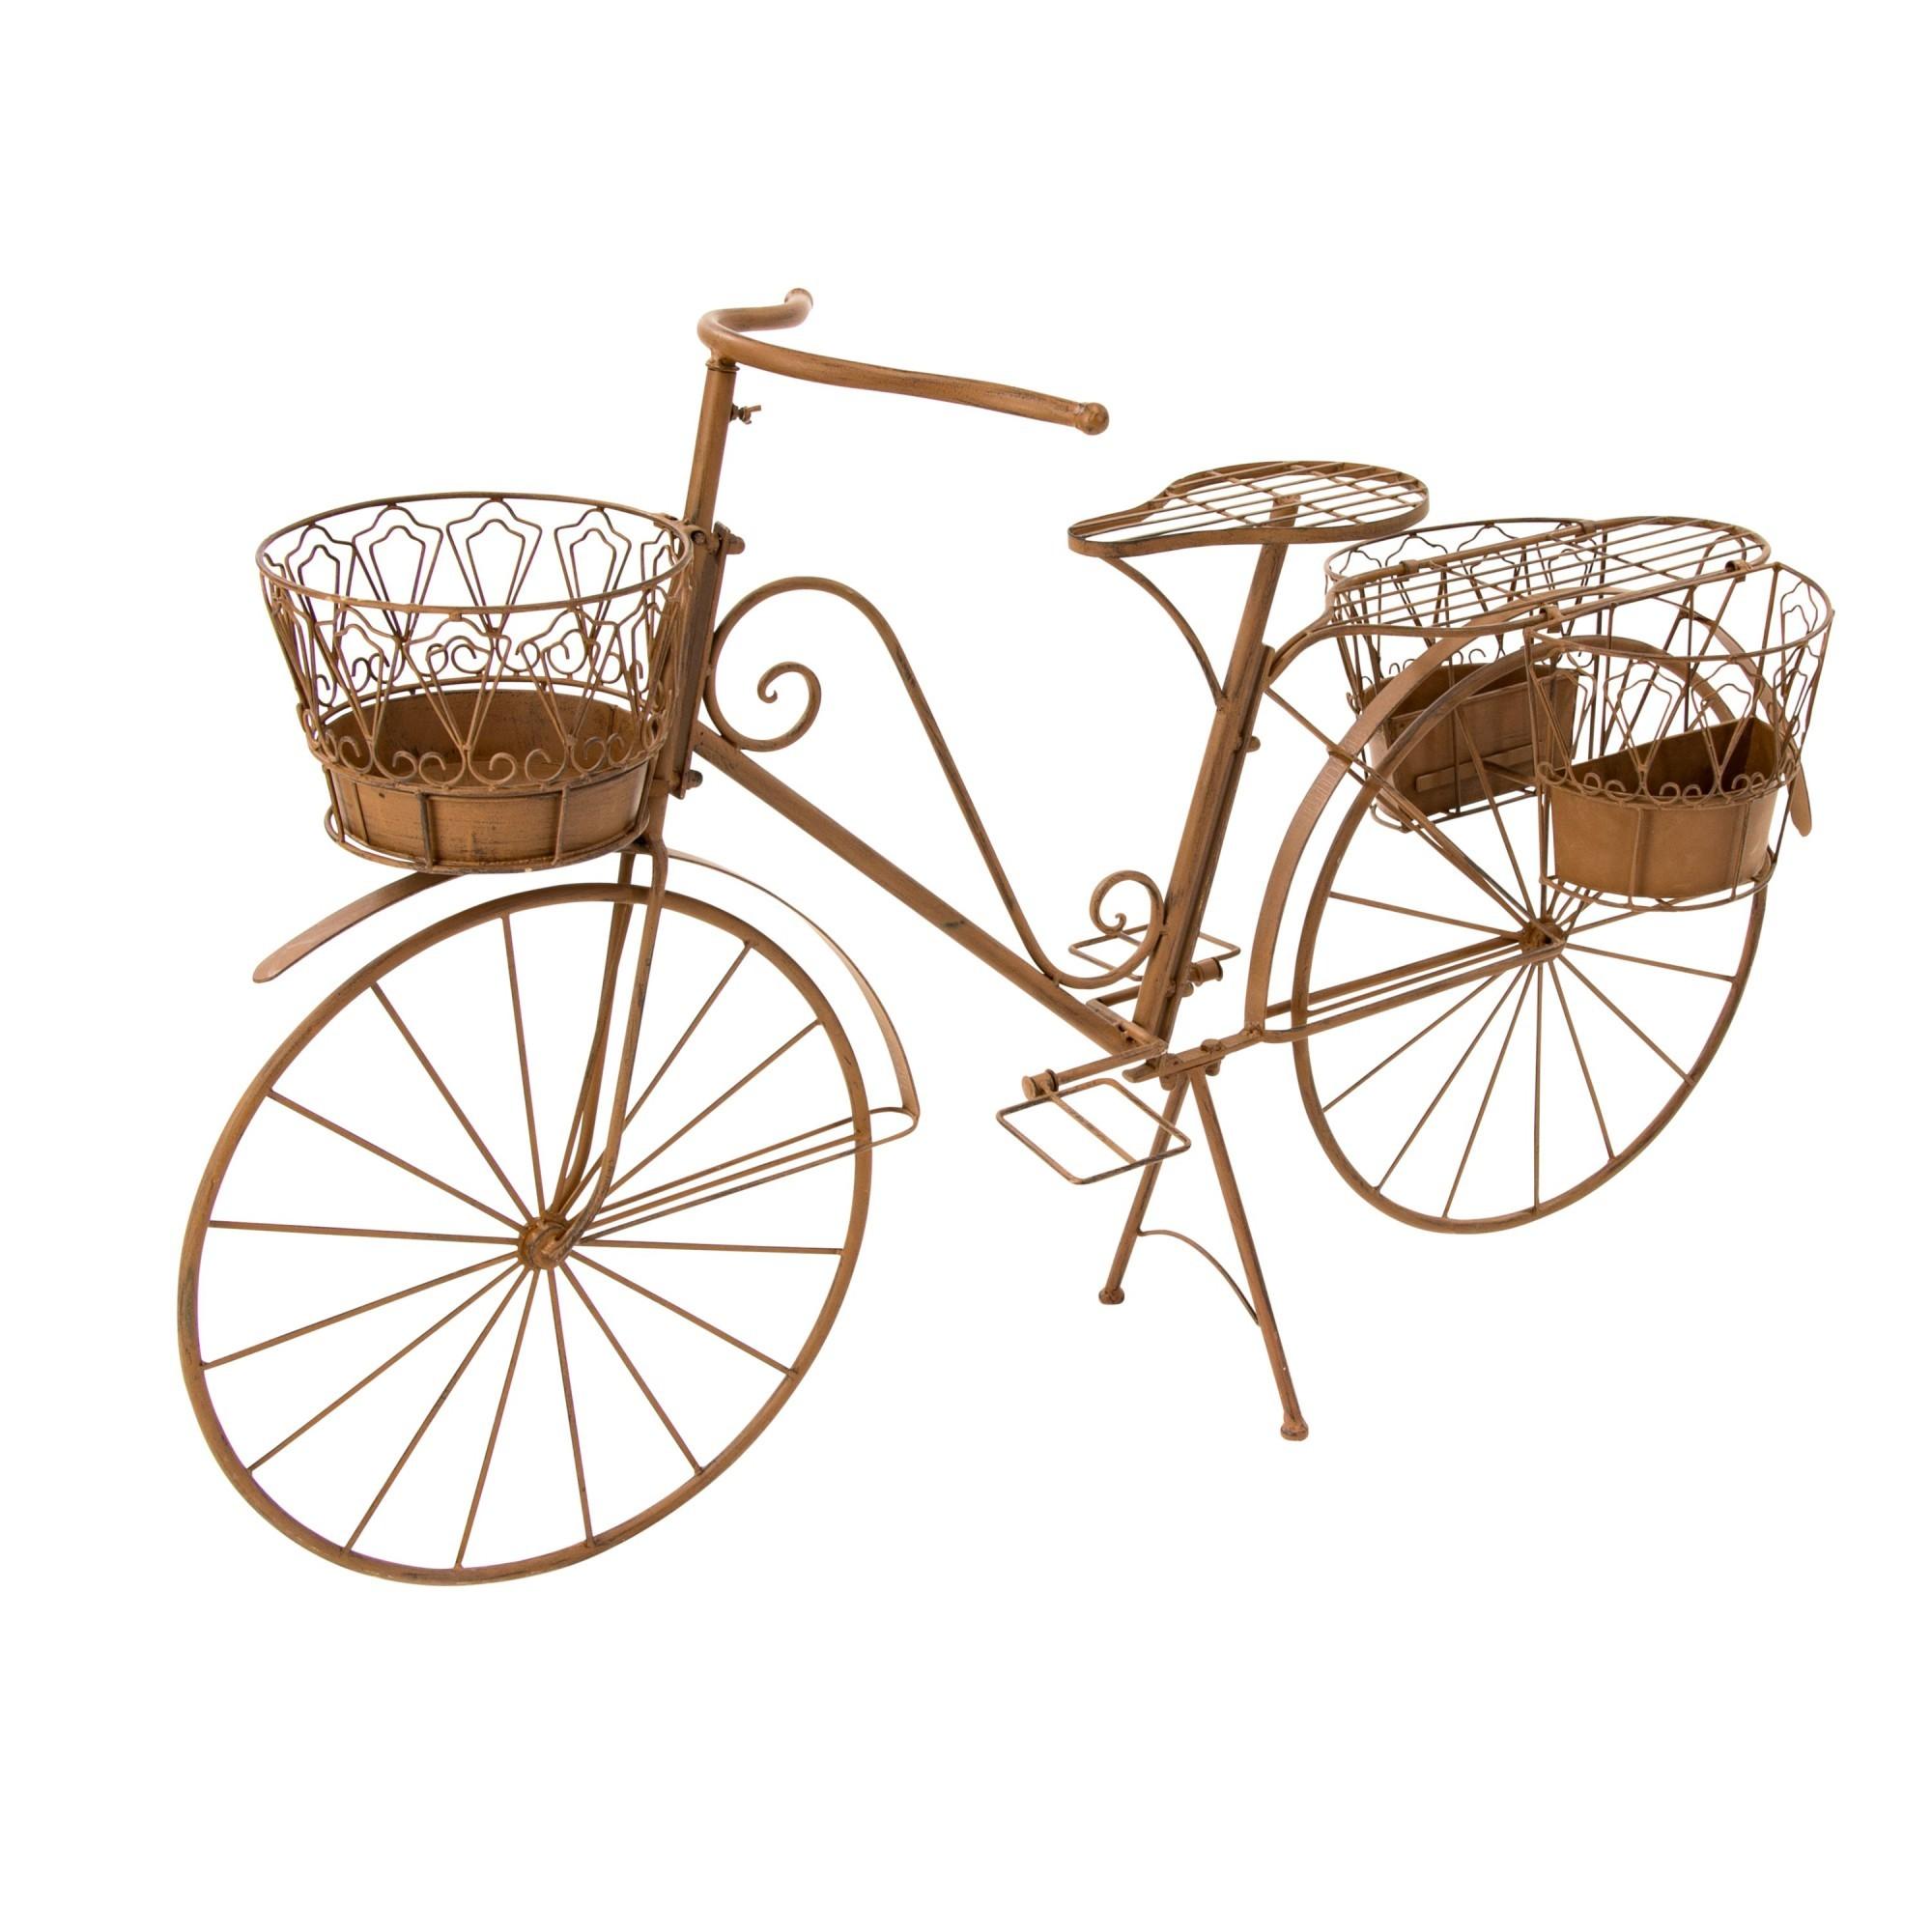 Deko Fahrrad mit Pflanzhalter Rusty, Metall